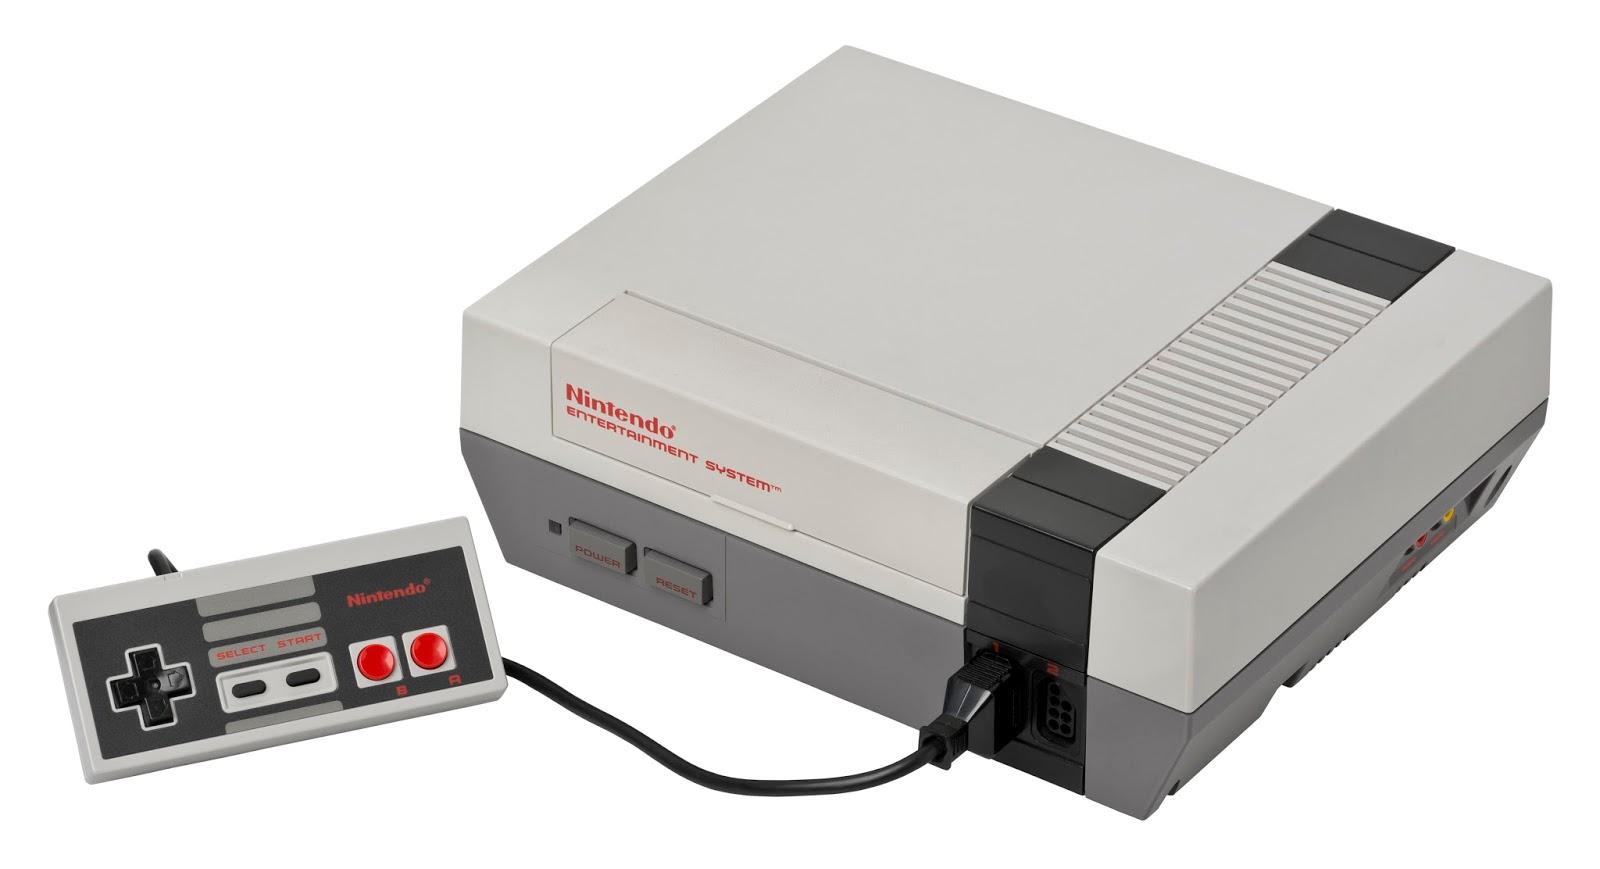 Imagen con la consola NES, Nintendo Entertainment System, 1985